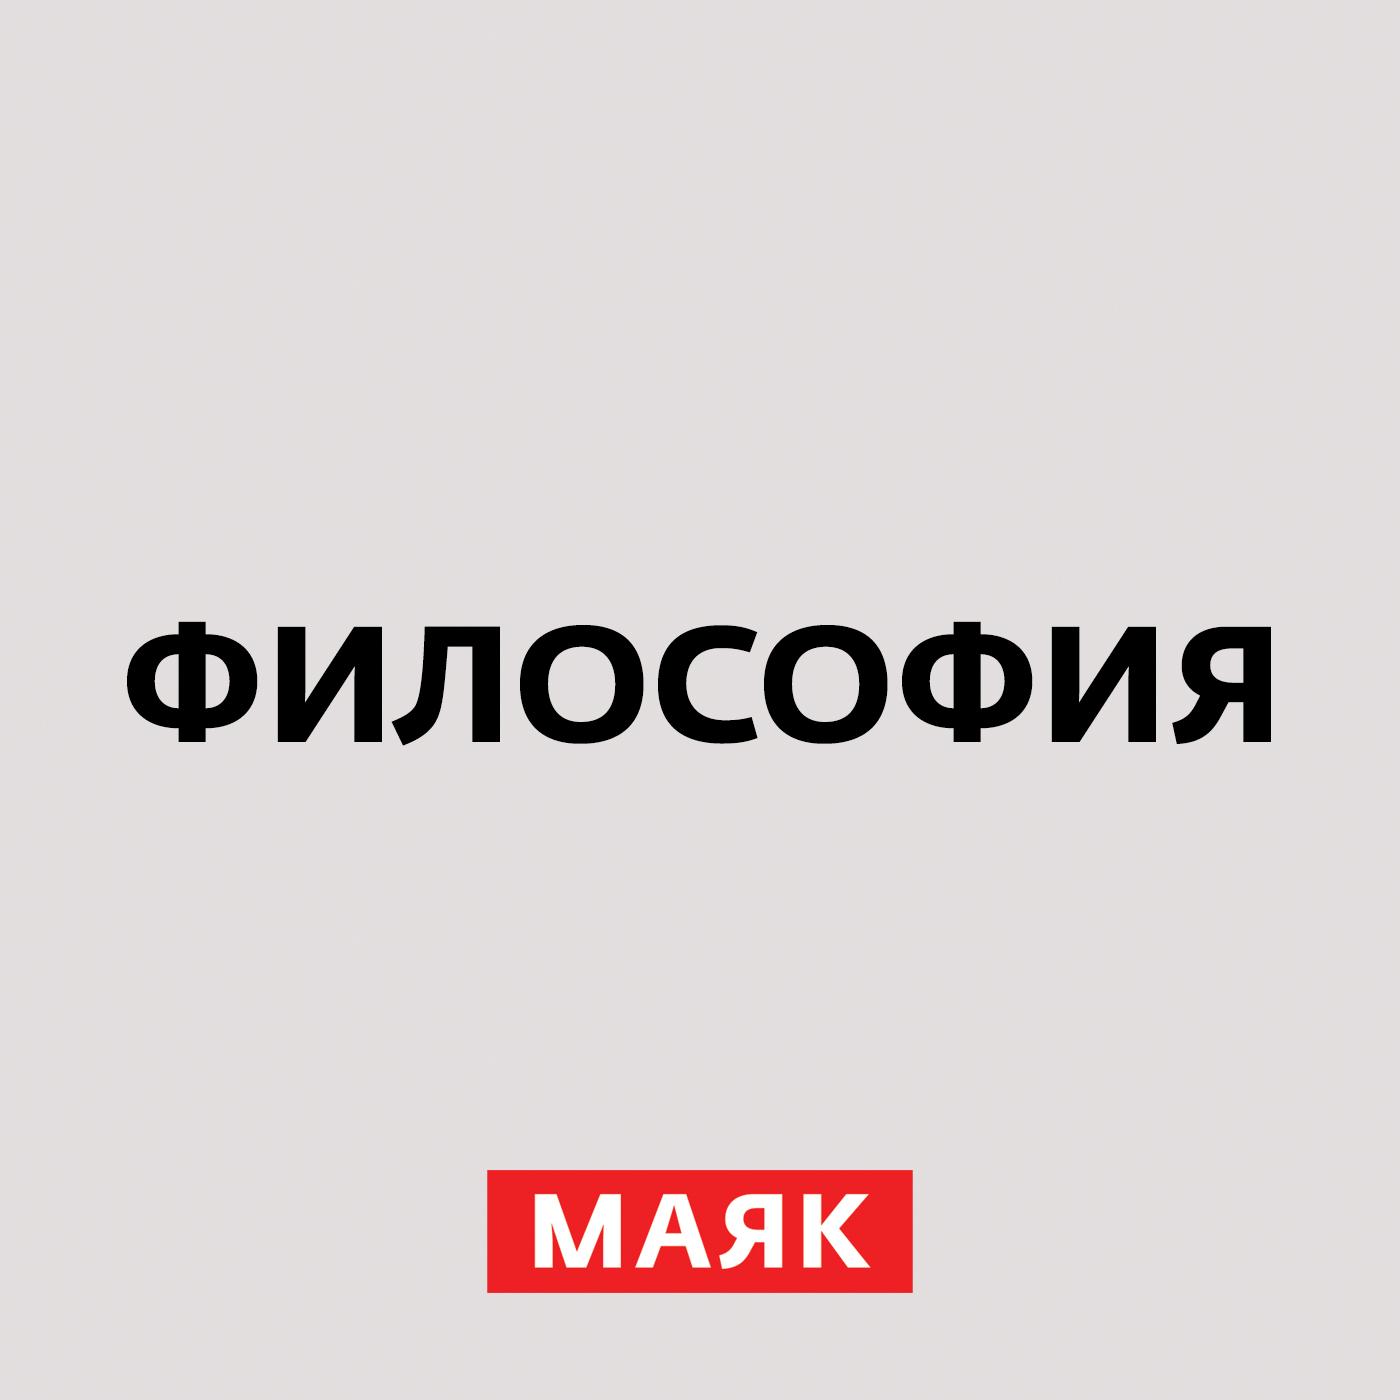 Творческий коллектив шоу «Объект 22» Утилитаризм